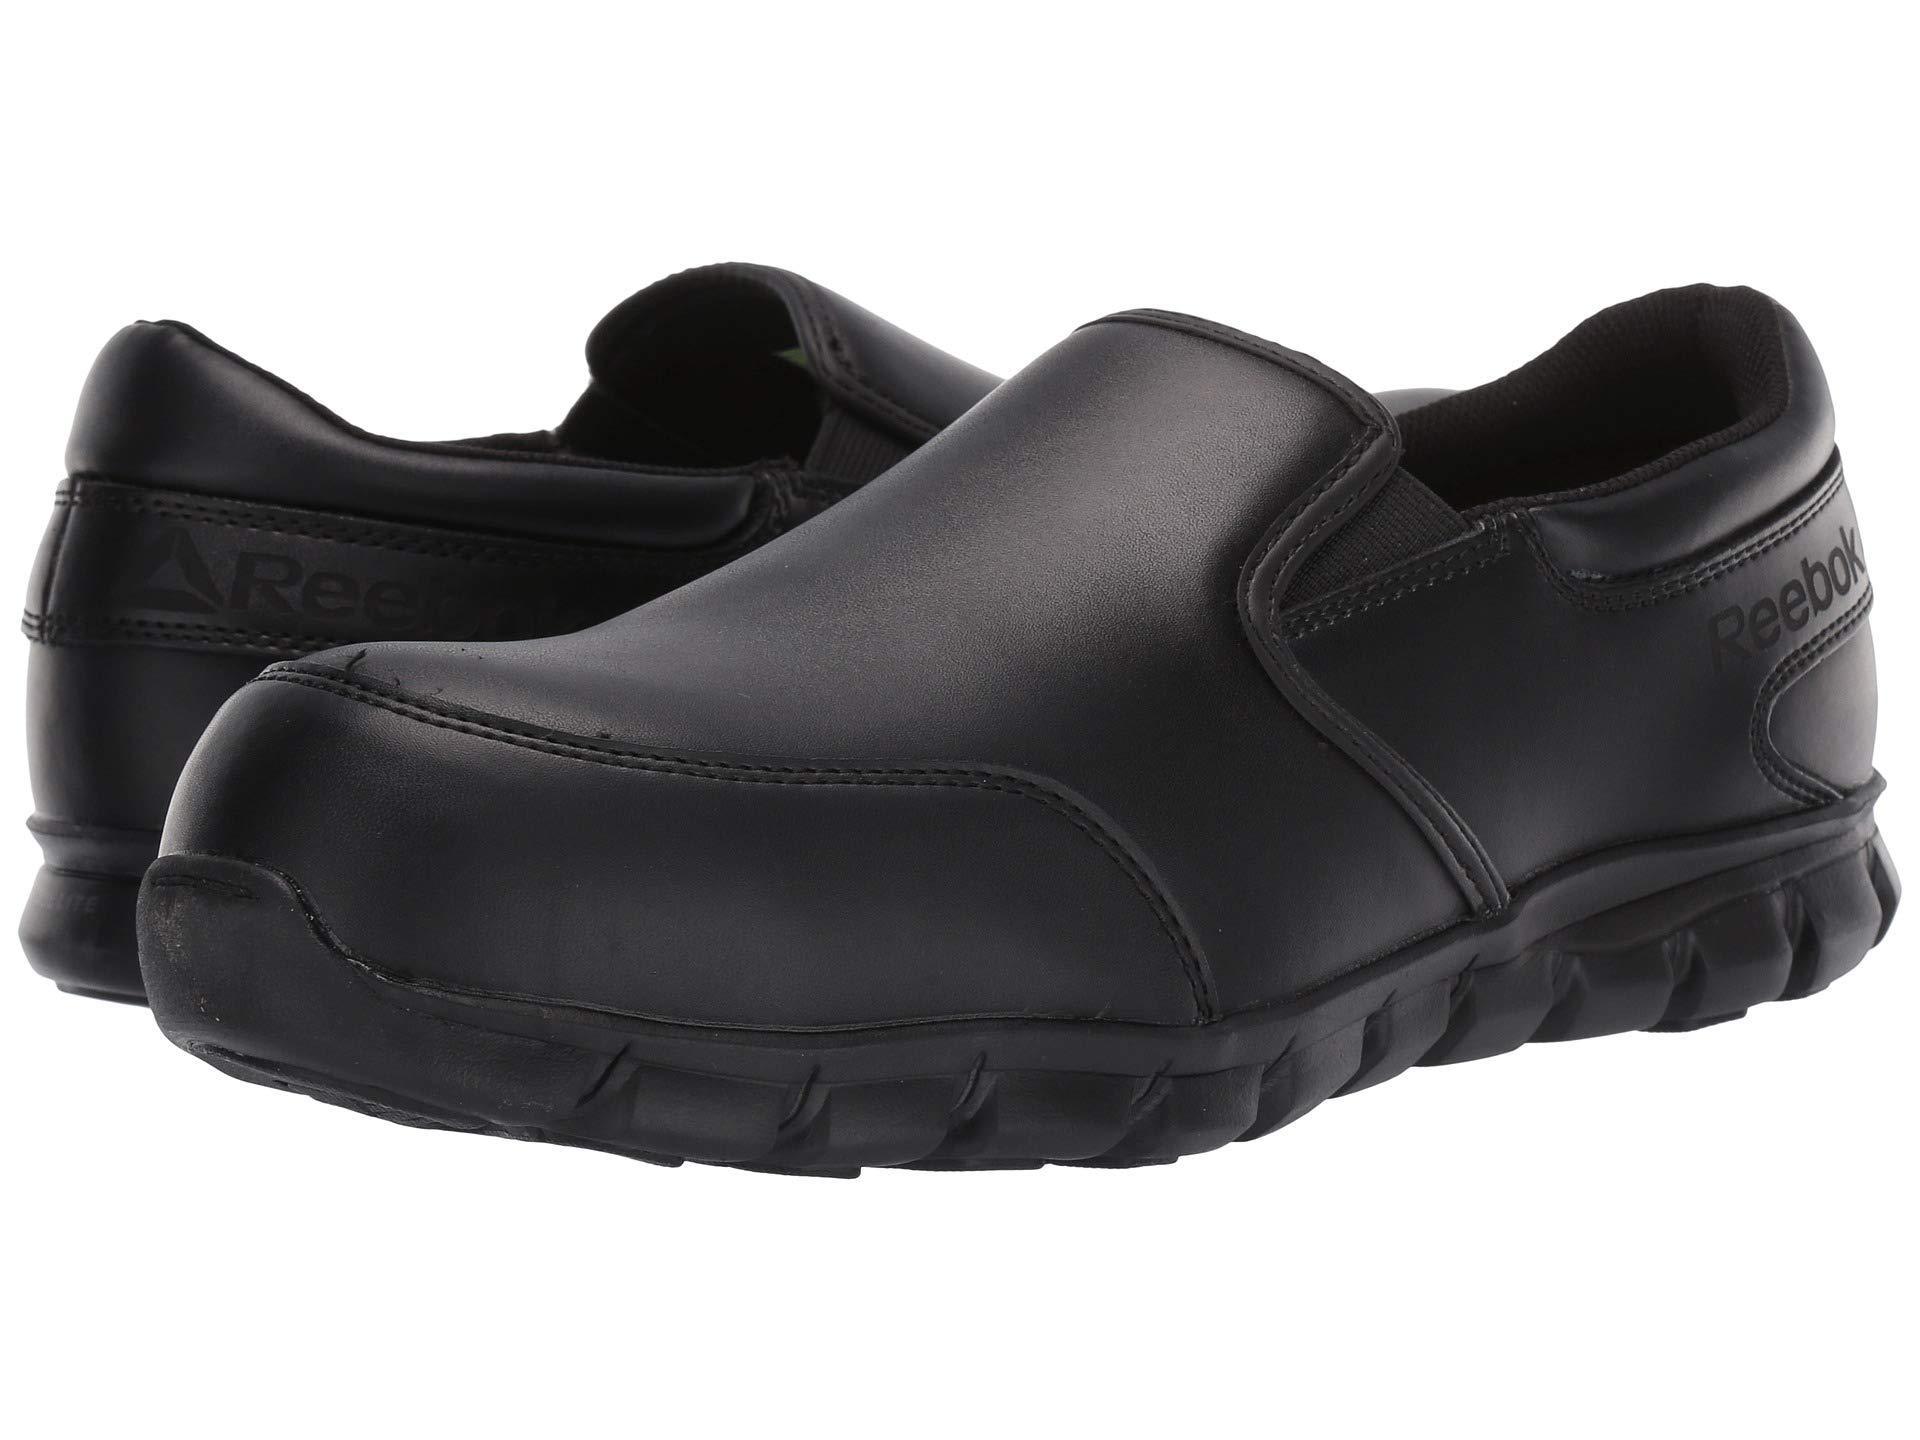 Reebok. Sublite Cushion Work Comp Toe Esd Slip On (black) Men s Work Boots 0ea2f8500